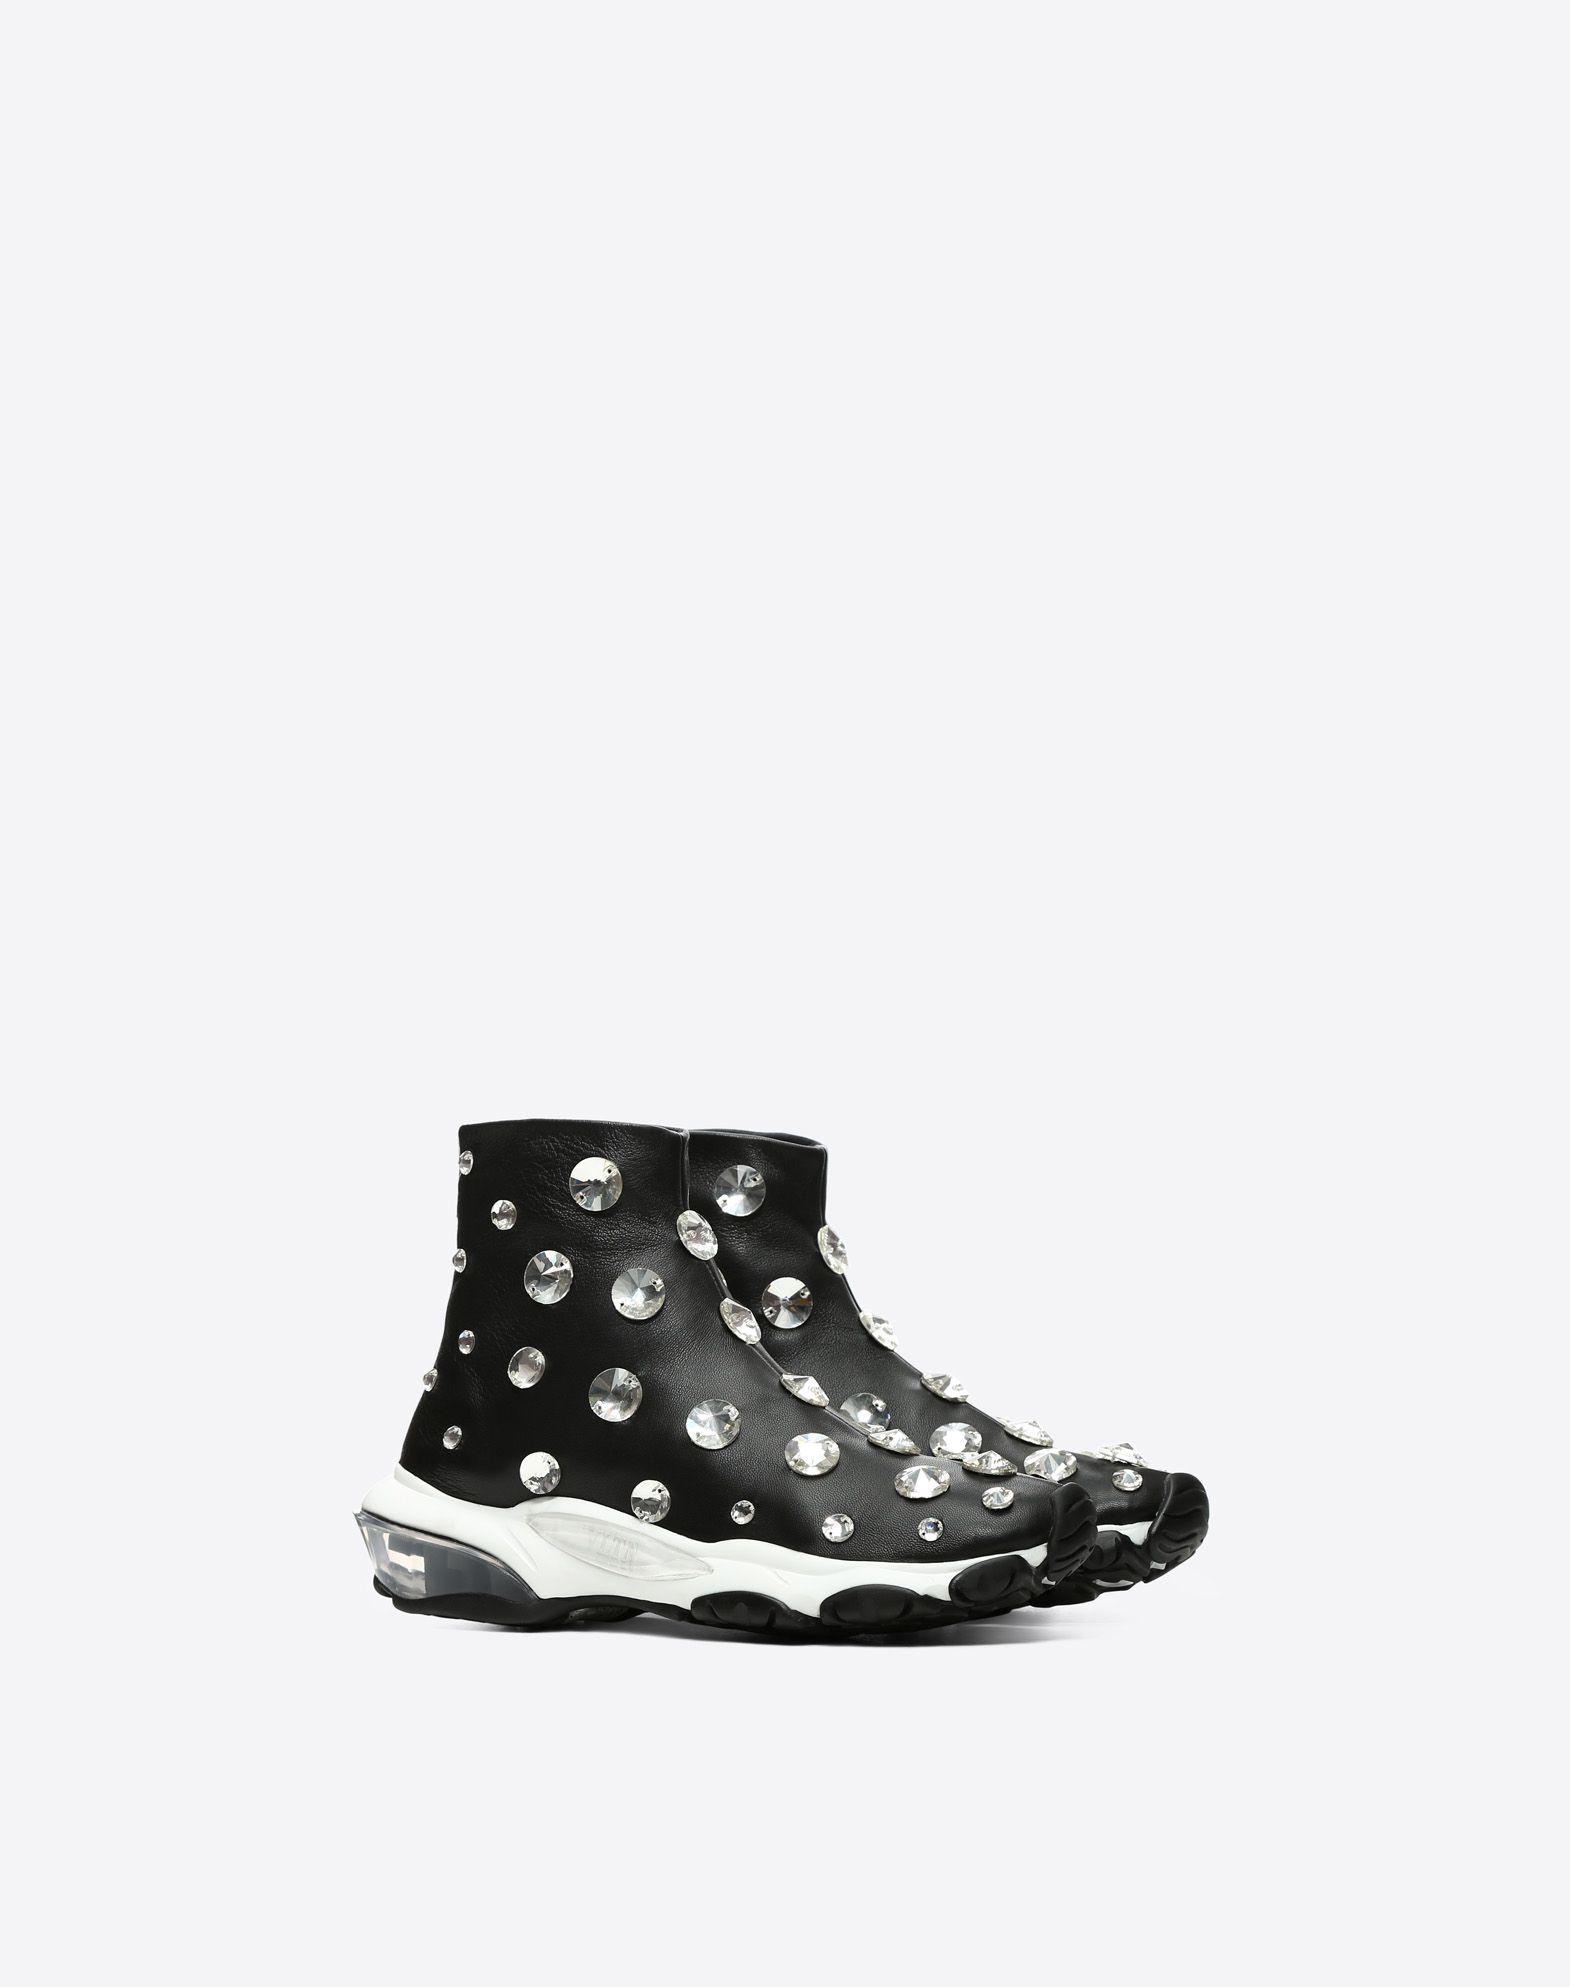 VALENTINO GARAVANI Sneakers Bounce SNEAKERS ALTAS D r